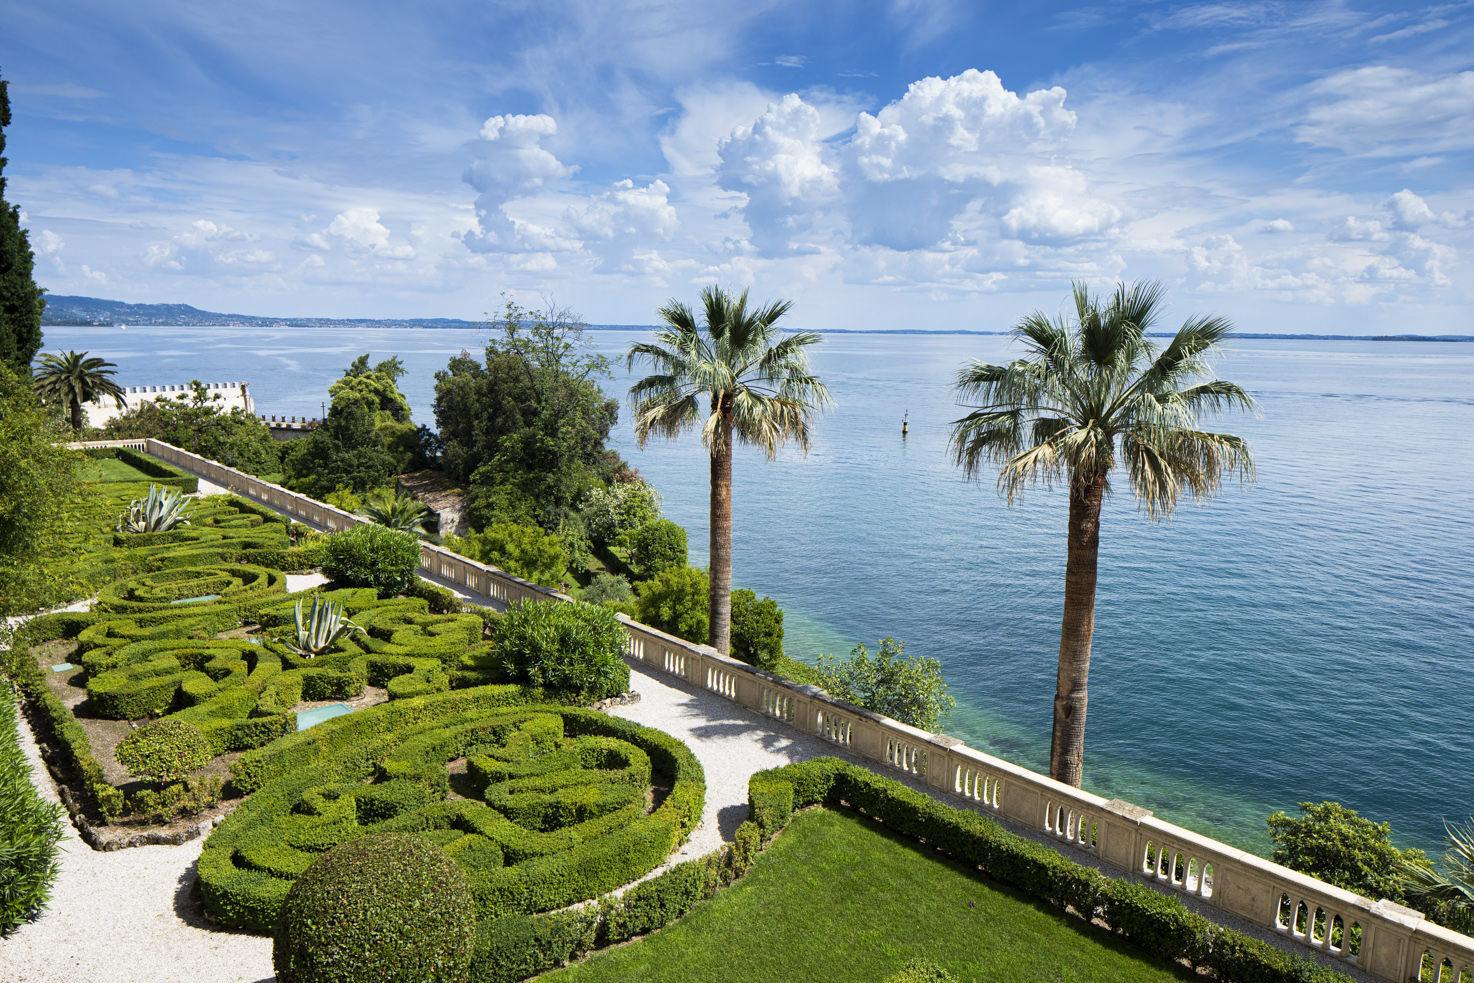 Gardens of Isola del Garda